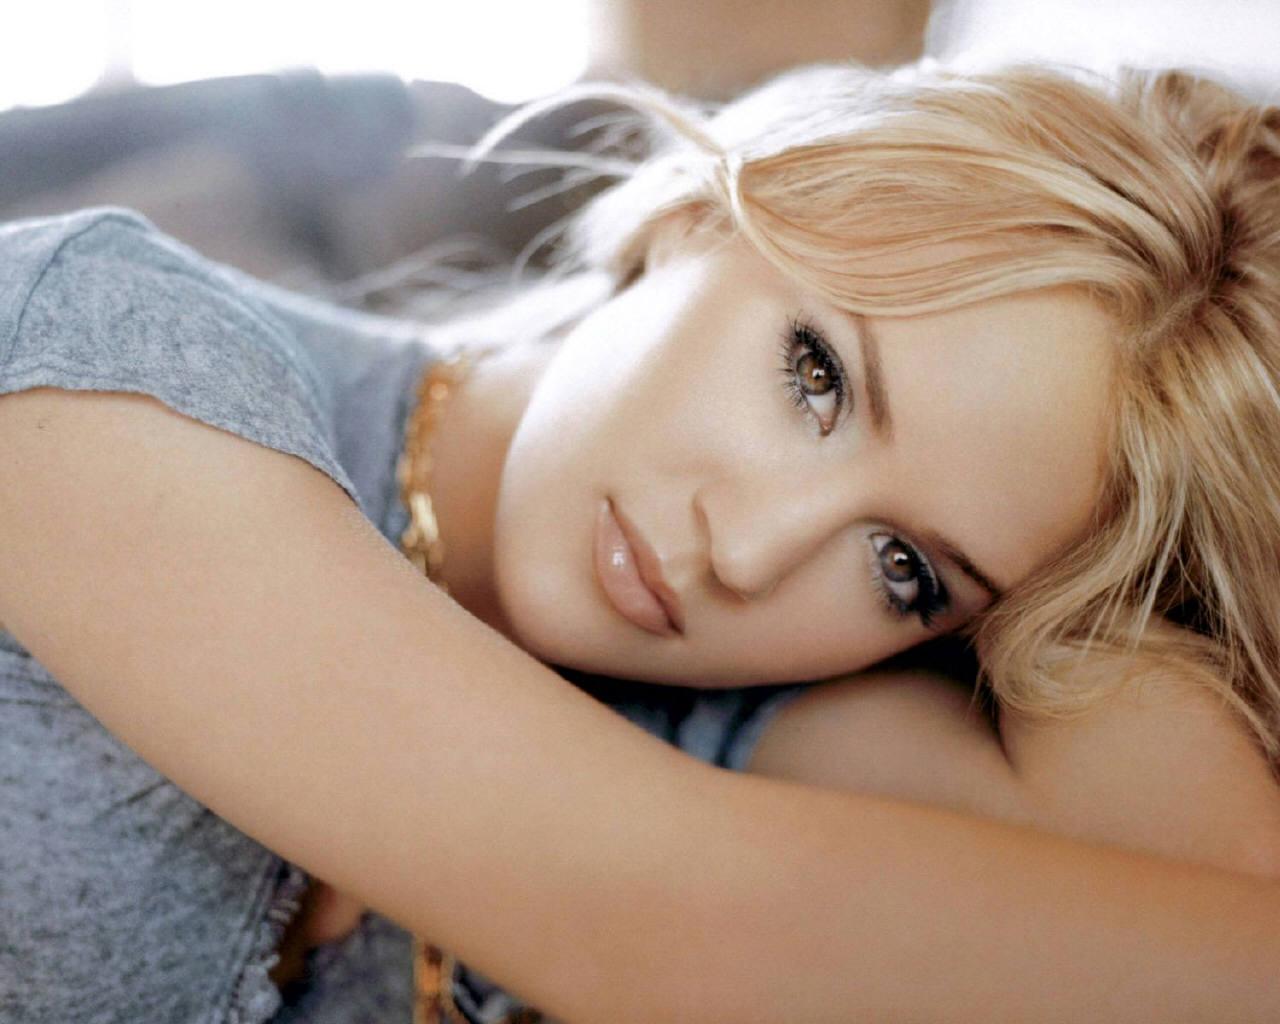 http://1.bp.blogspot.com/-sXeUC5FpSV4/TjcwVKfP67I/AAAAAAAABrw/ONOqmDklf5U/s1600/Carrie-Underwood.jpg